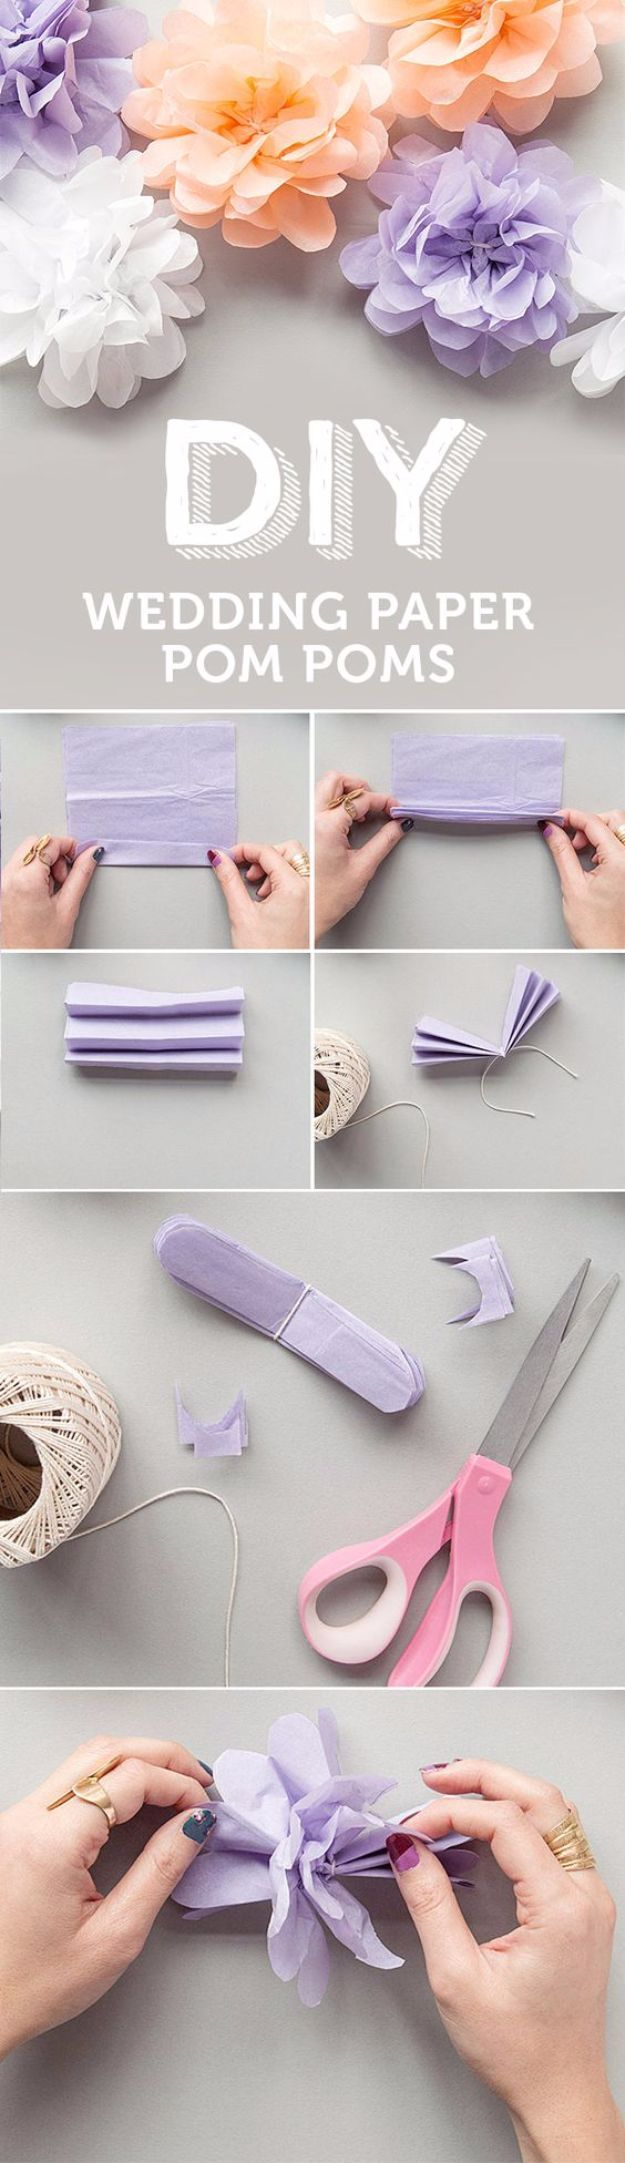 best paper crafts images on pinterest bricolage construction